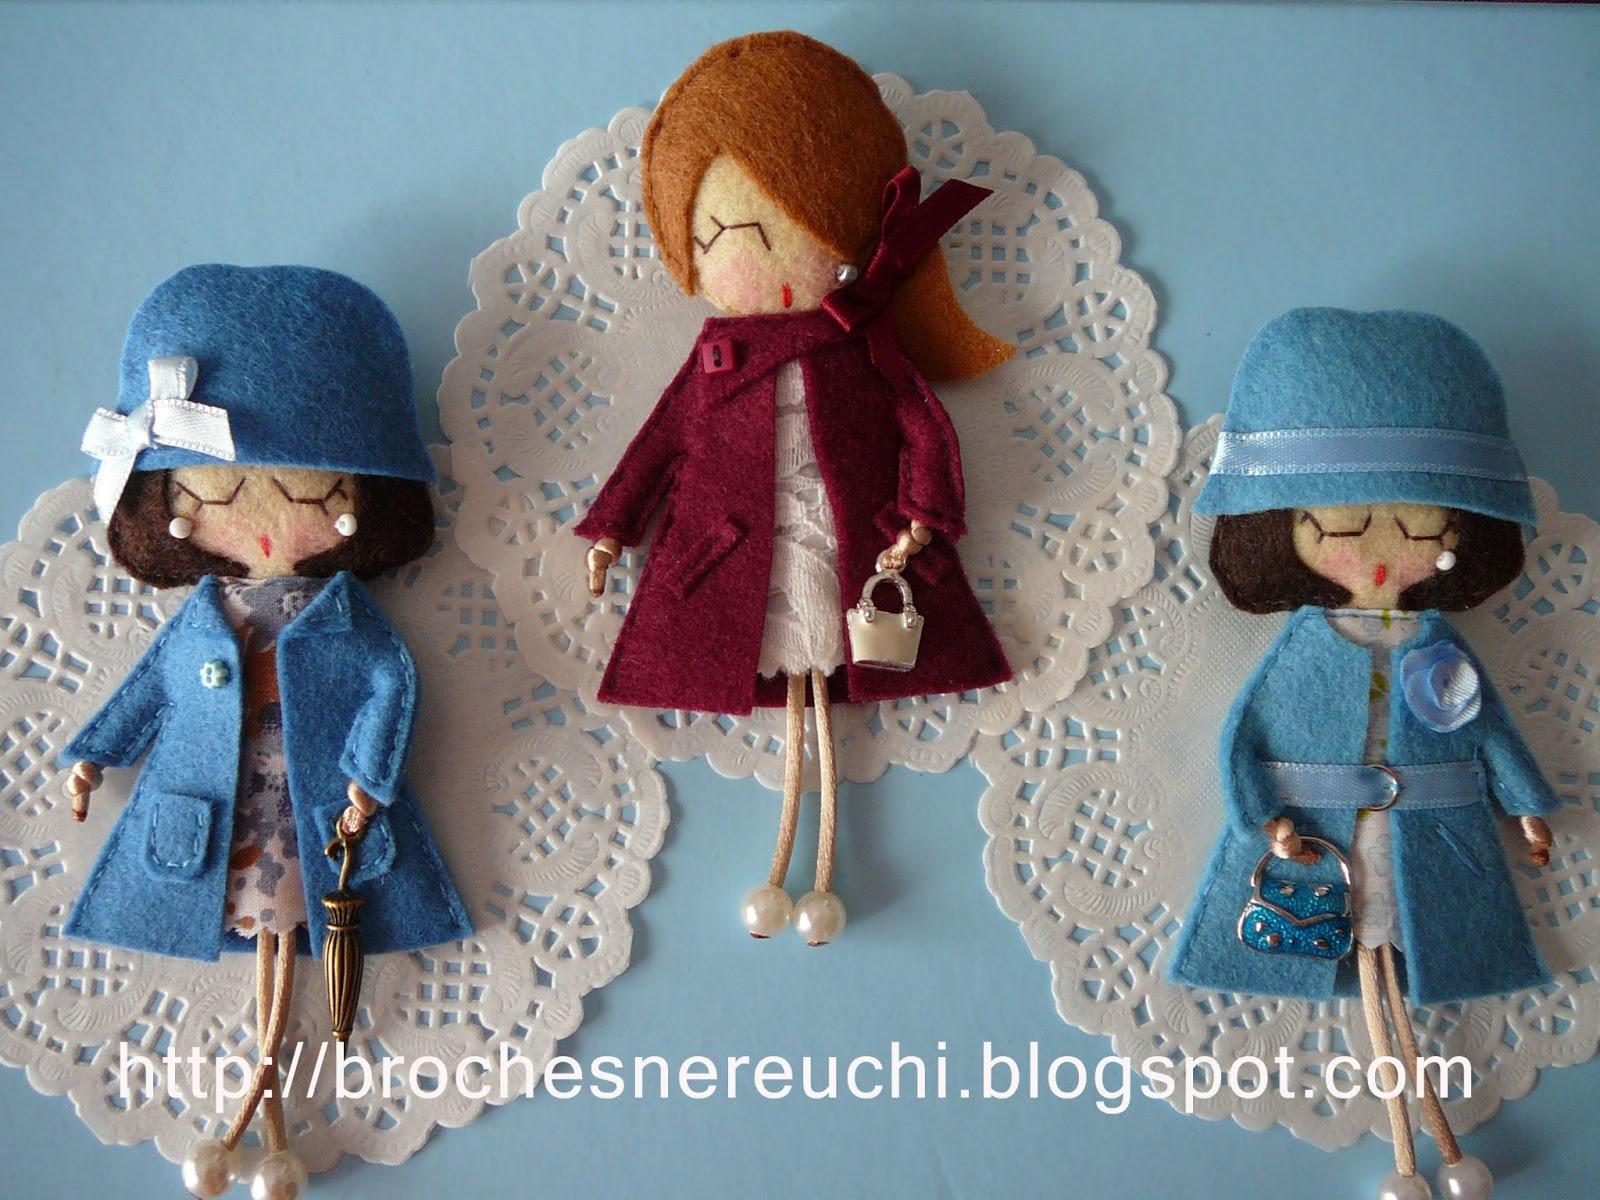 Игра в куколки шьём мягкие брошки из фетра Ярмарка 15